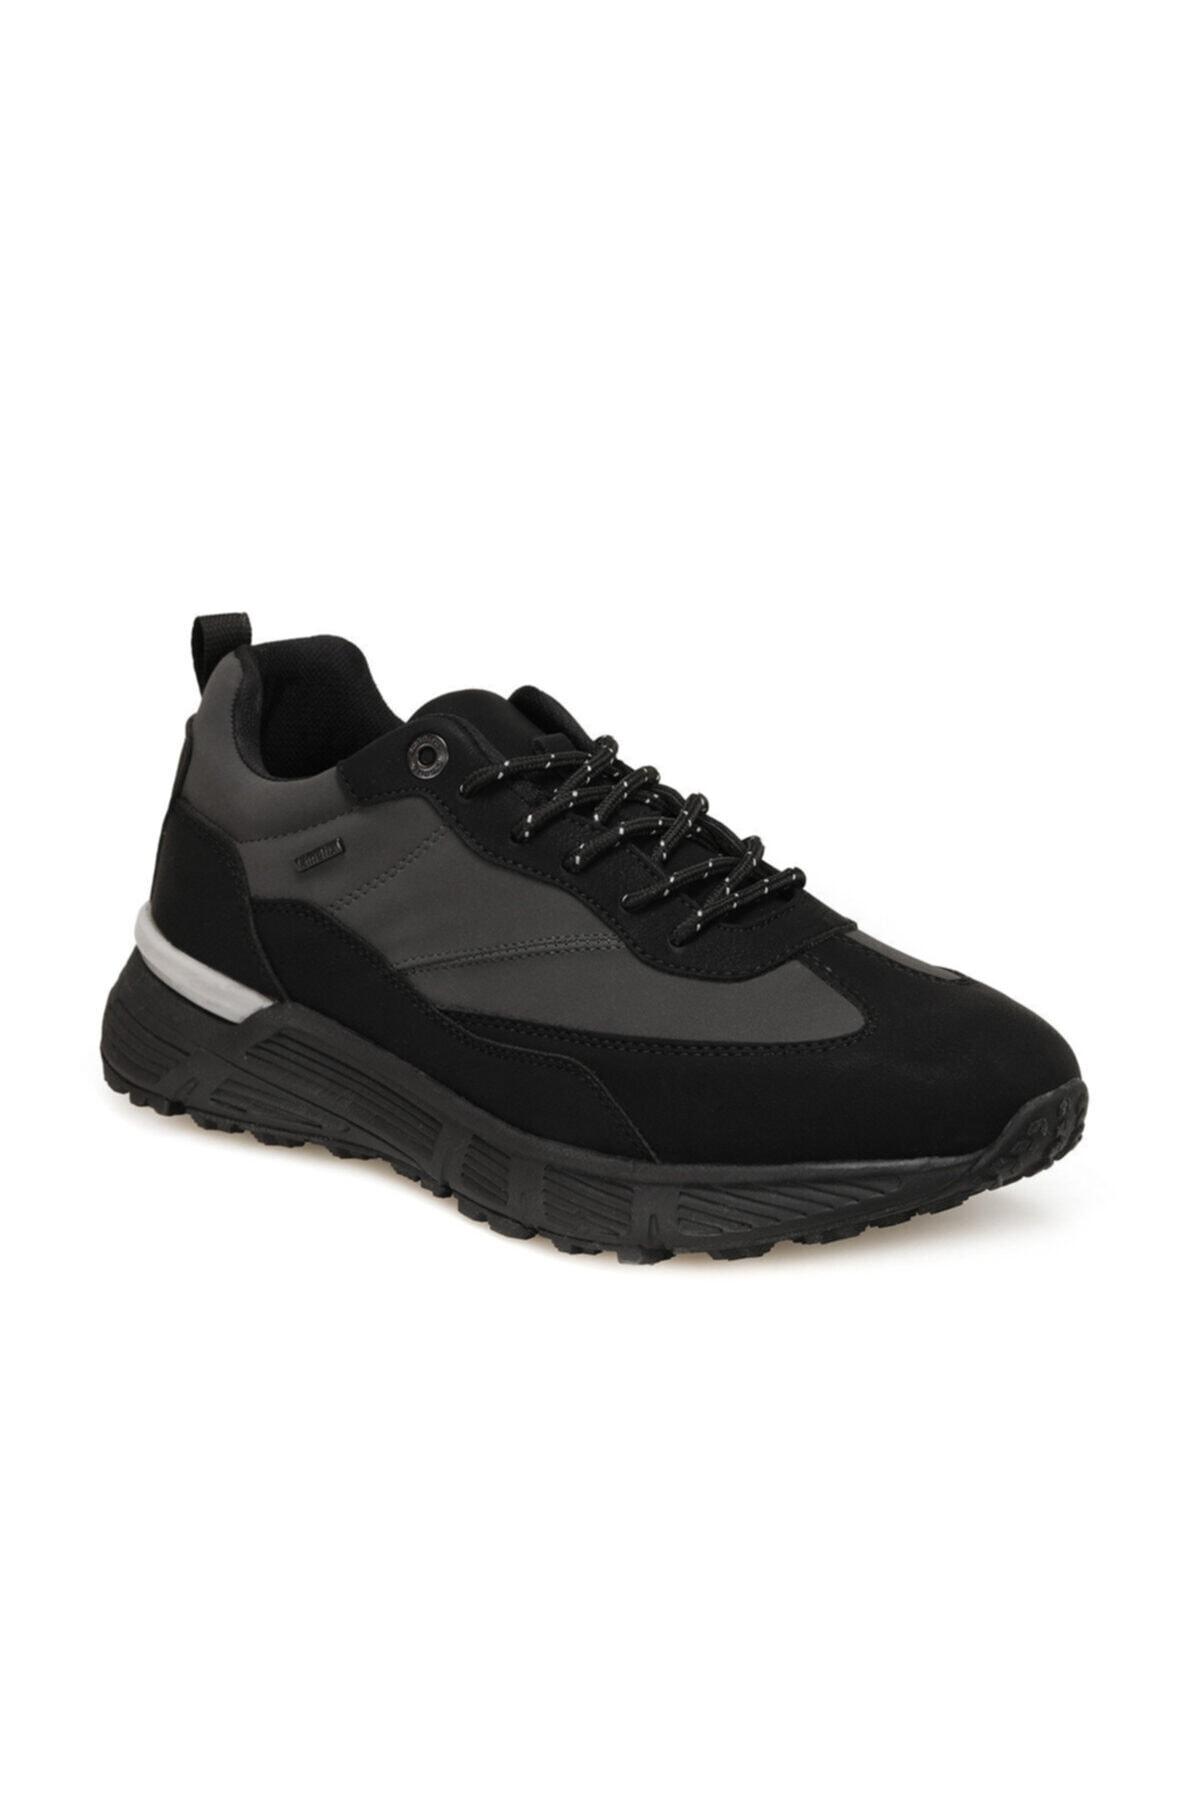 YEWI Siyah Erkek Sneaker Ayakkabı 100541475